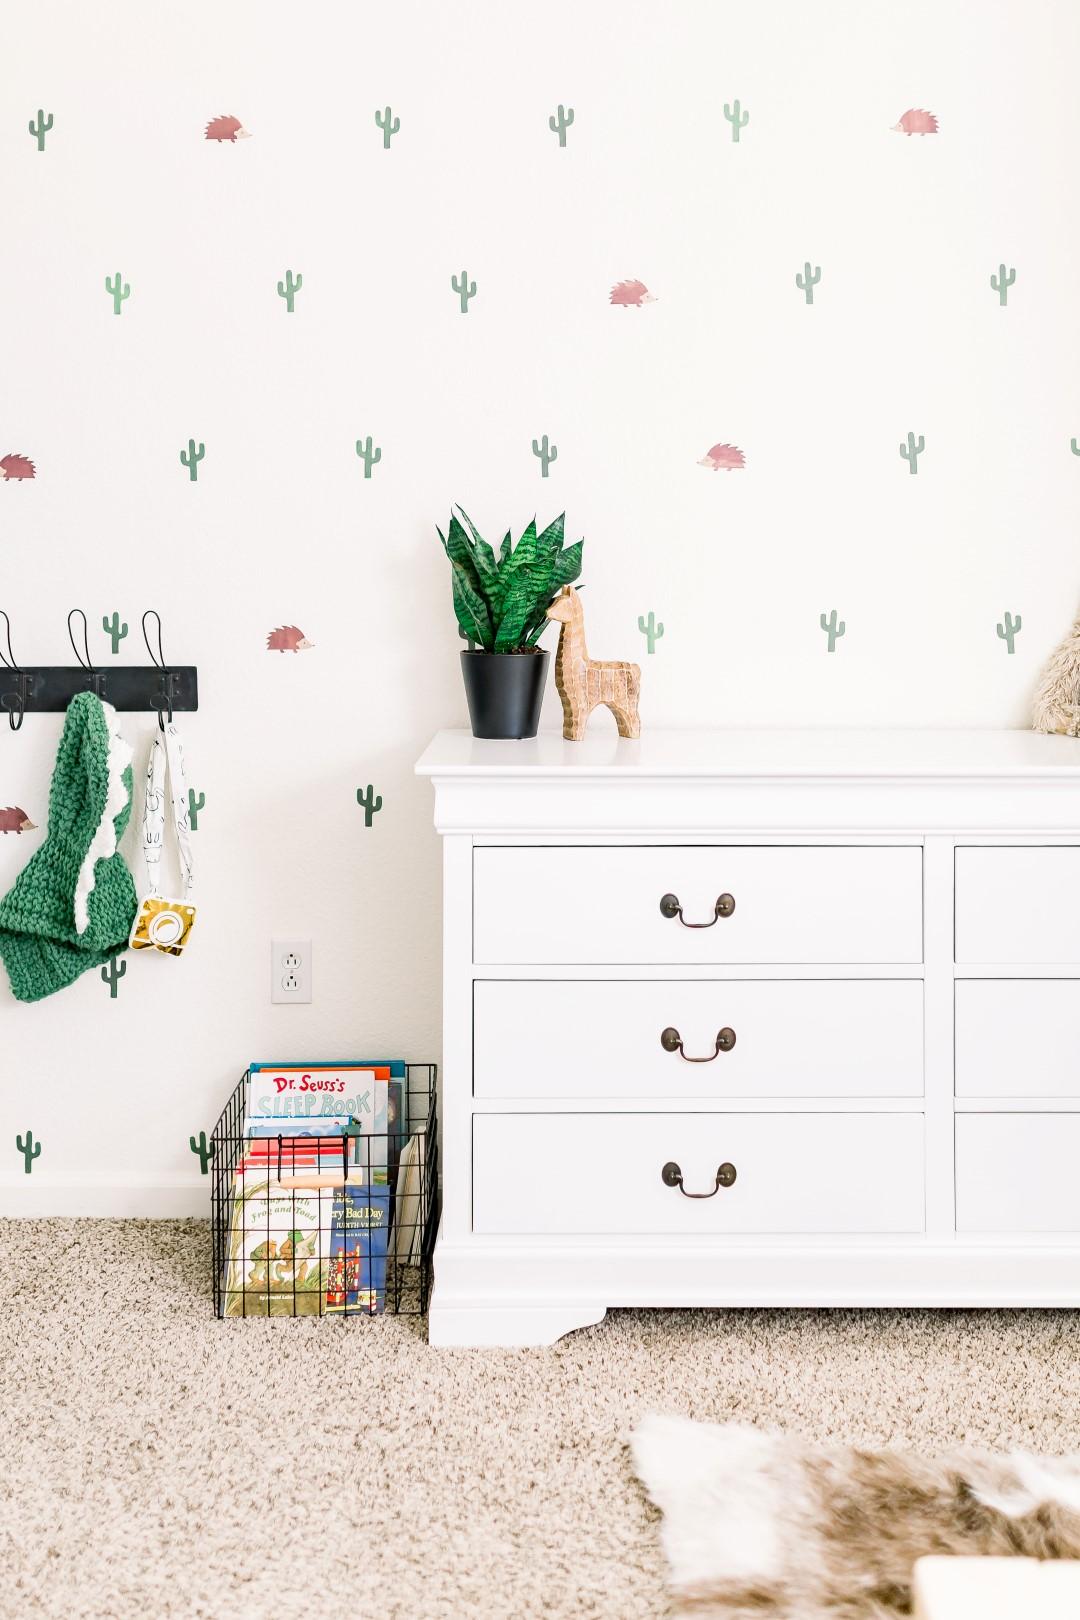 Cactus Hedgehog Boys Room - Her Hashtag Life